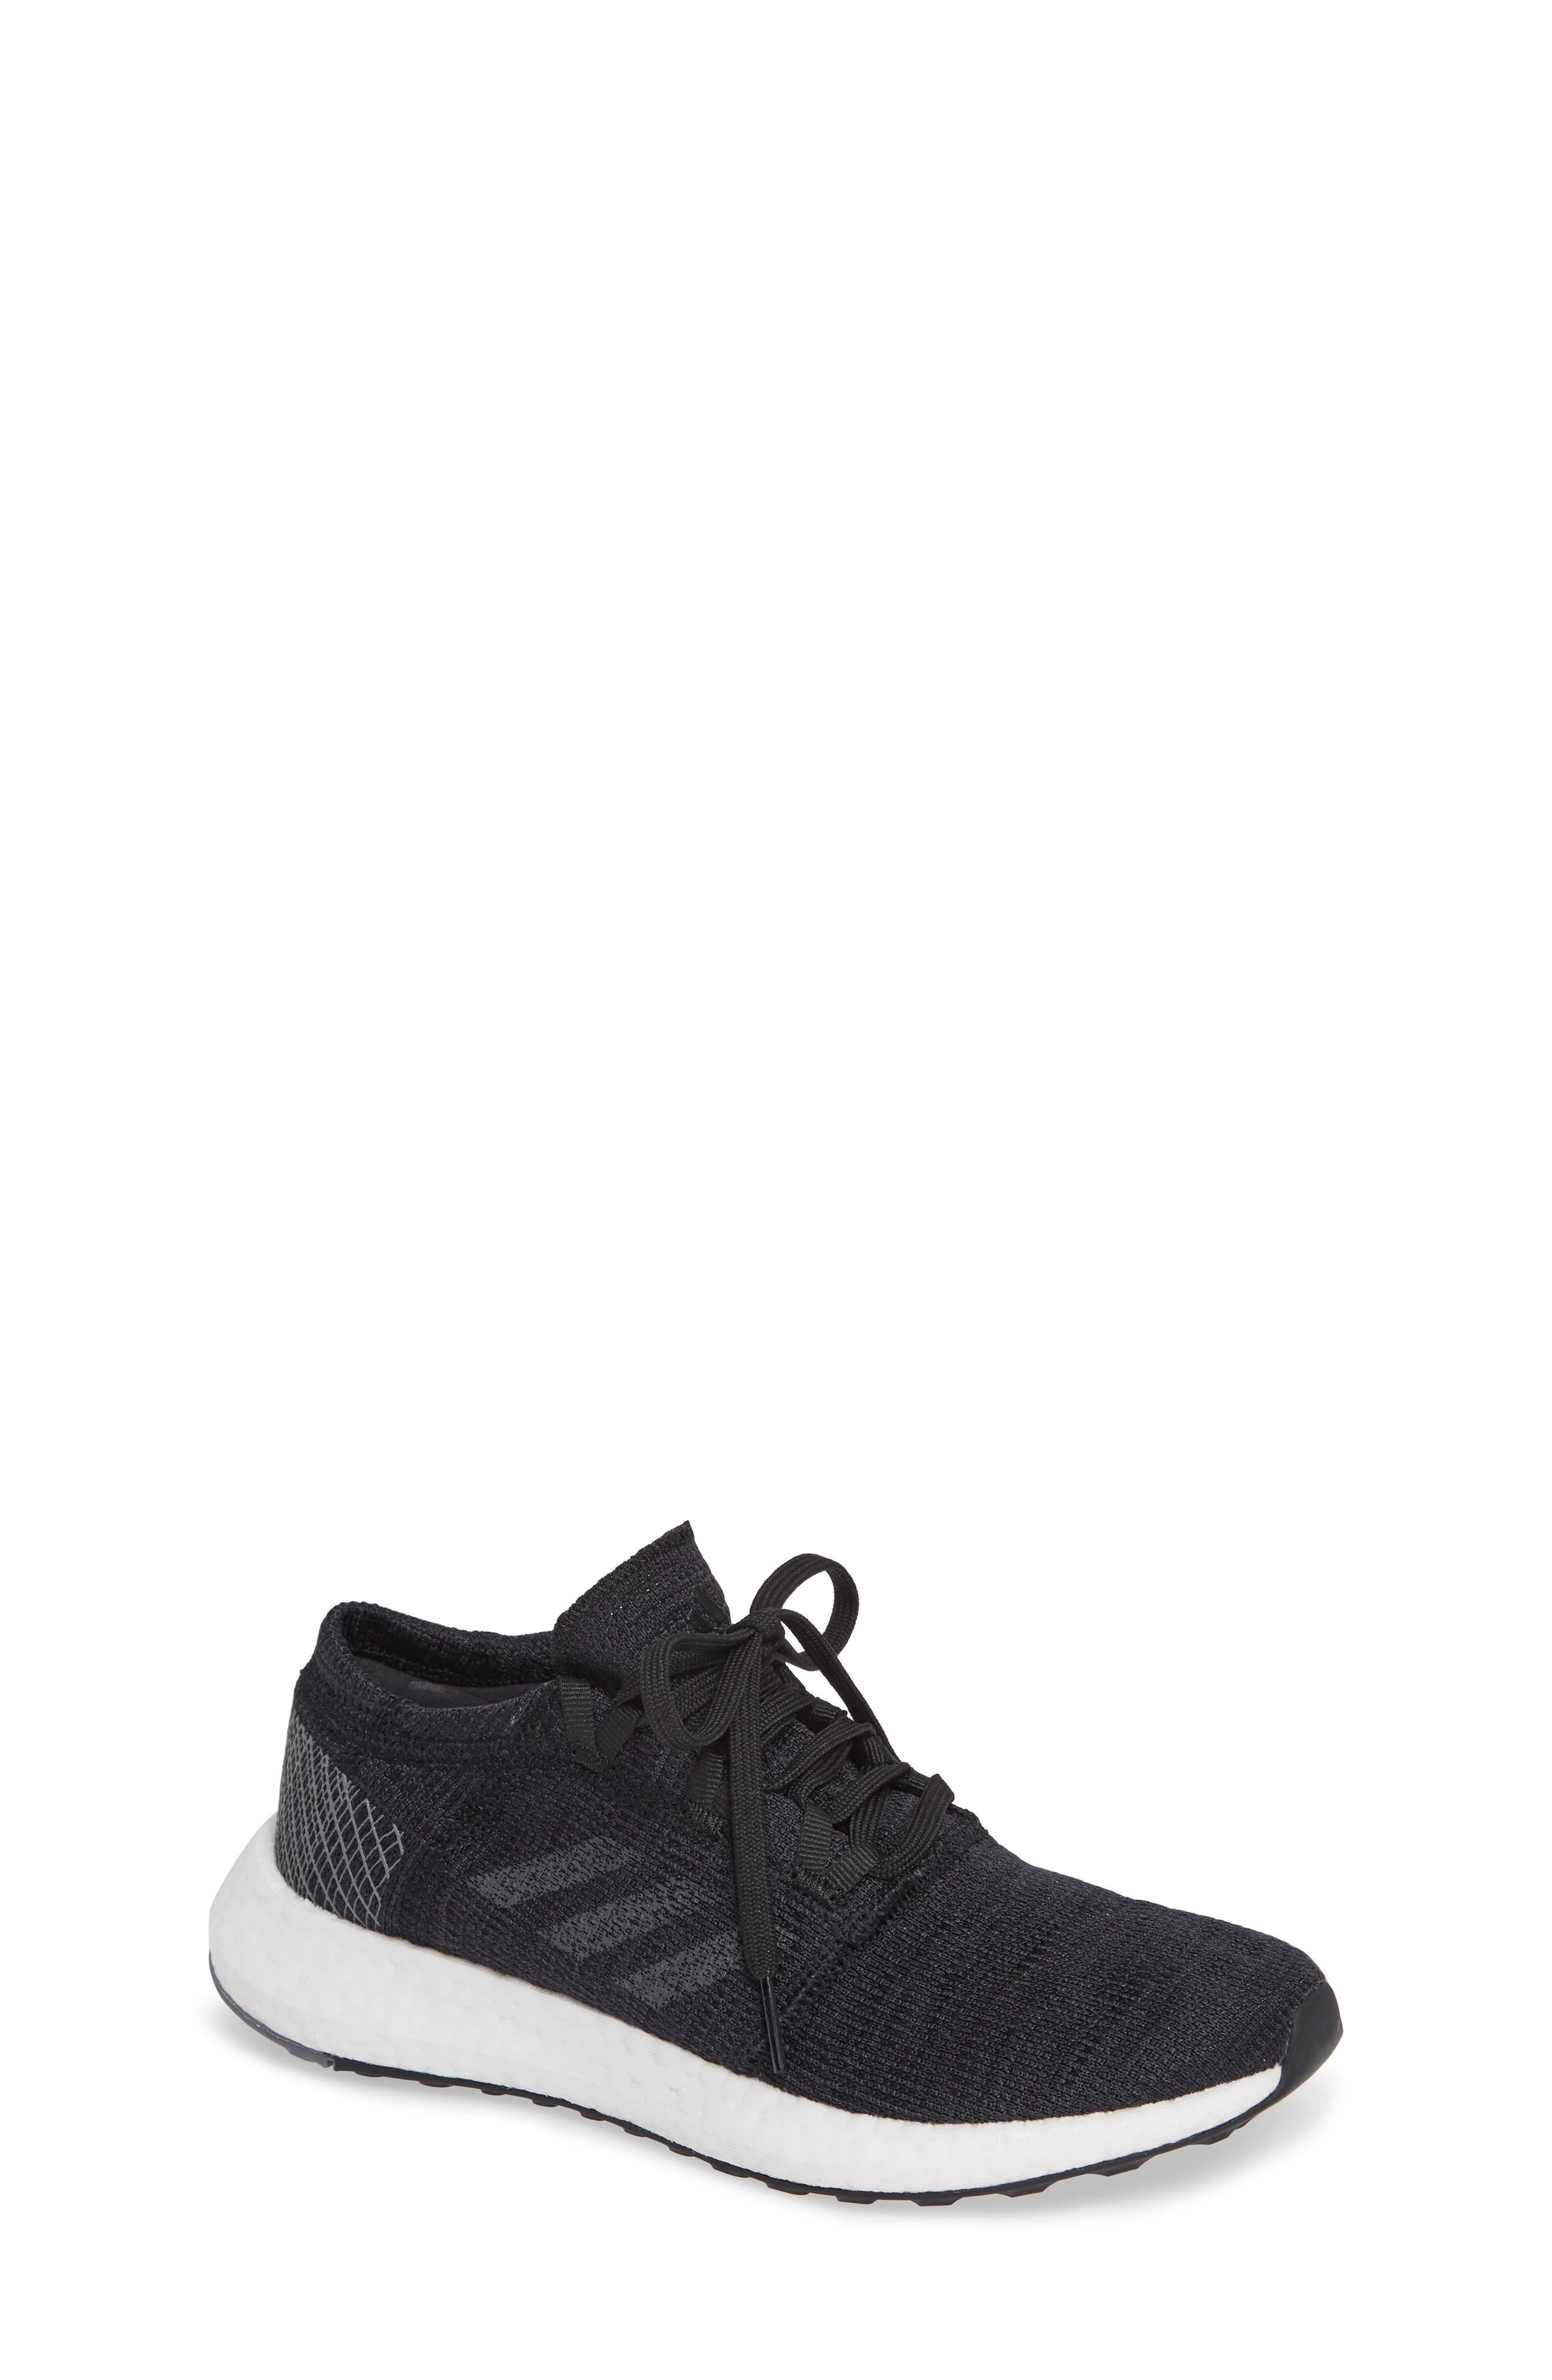 PureBoost GO Running Shoe,                             Main thumbnail 1, color,                             BLACK/ GREY